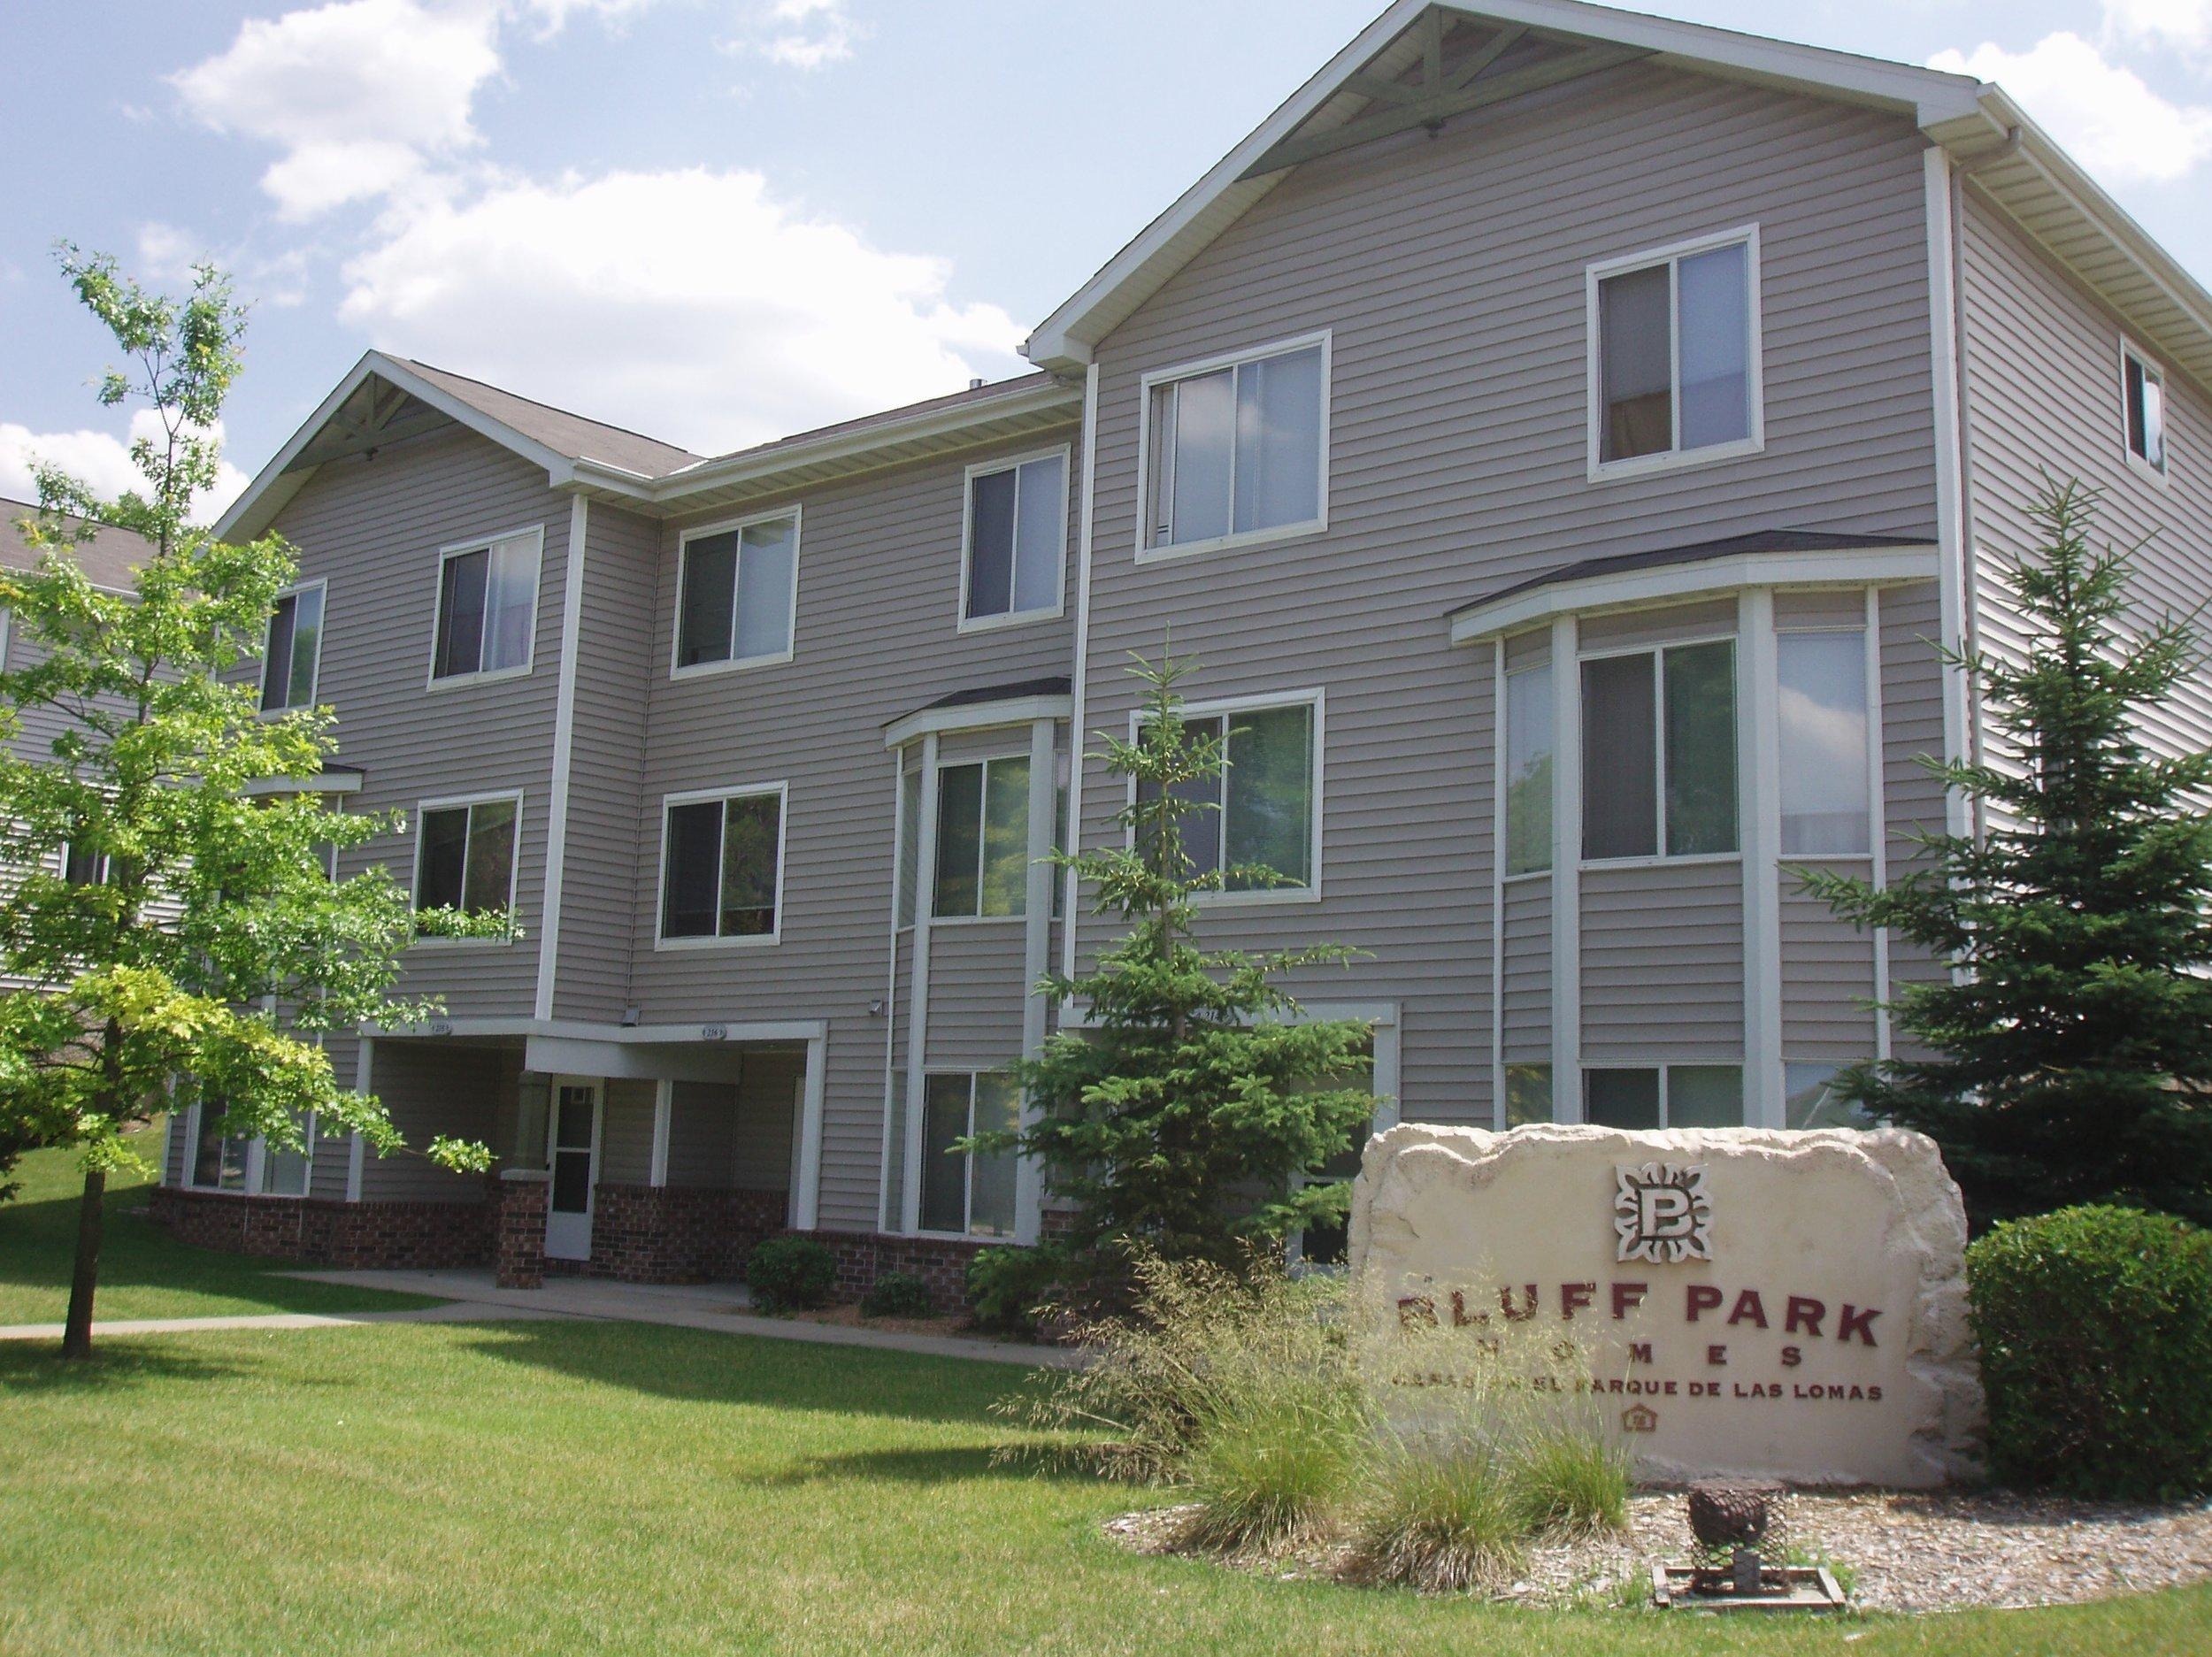 Bluff Park Homes